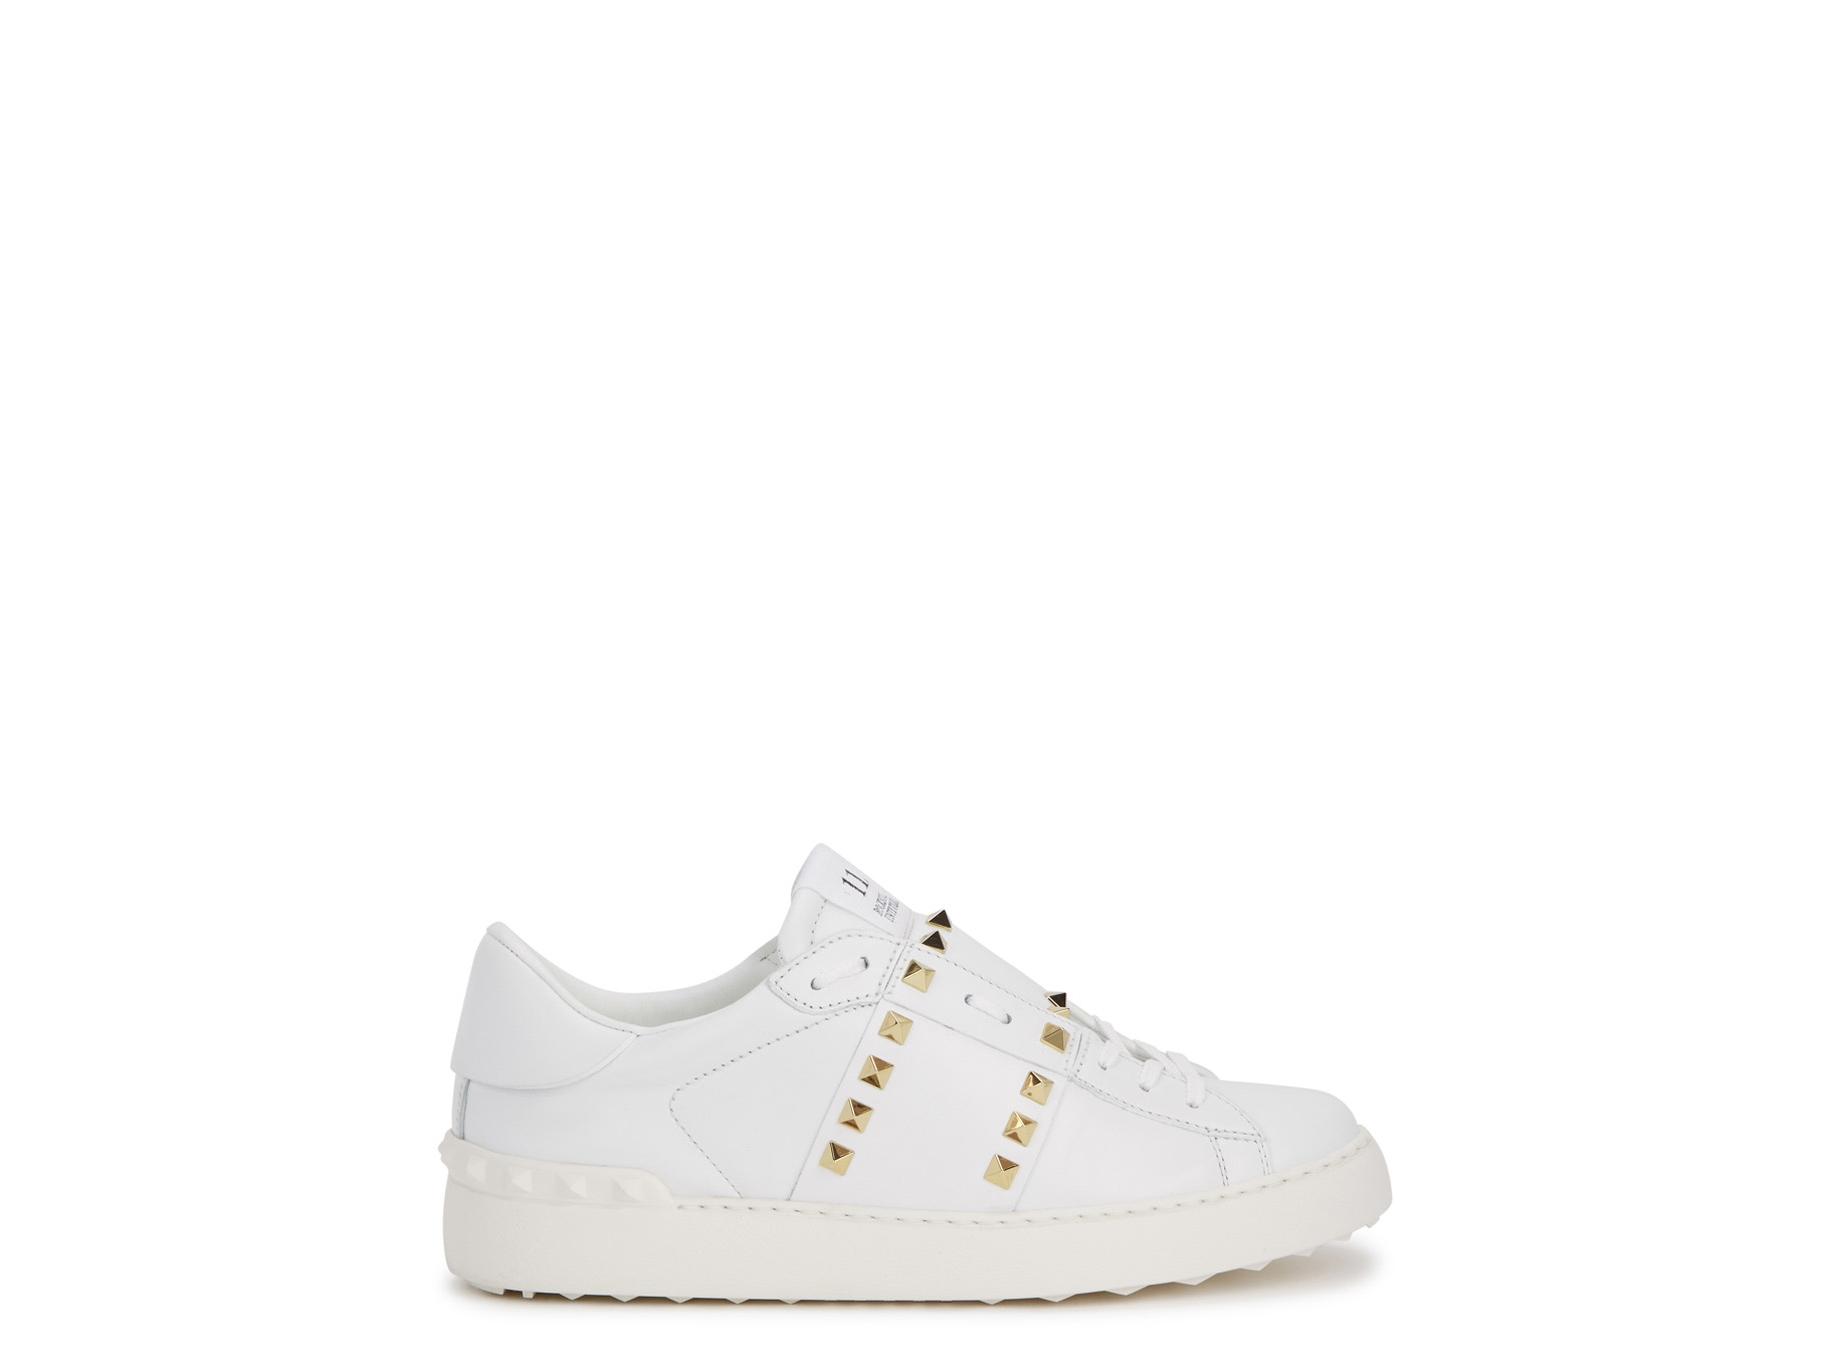 e917a0837e395 Valentino Garavani Rockstud Untitled 11 leather sneakers - Harvey ...